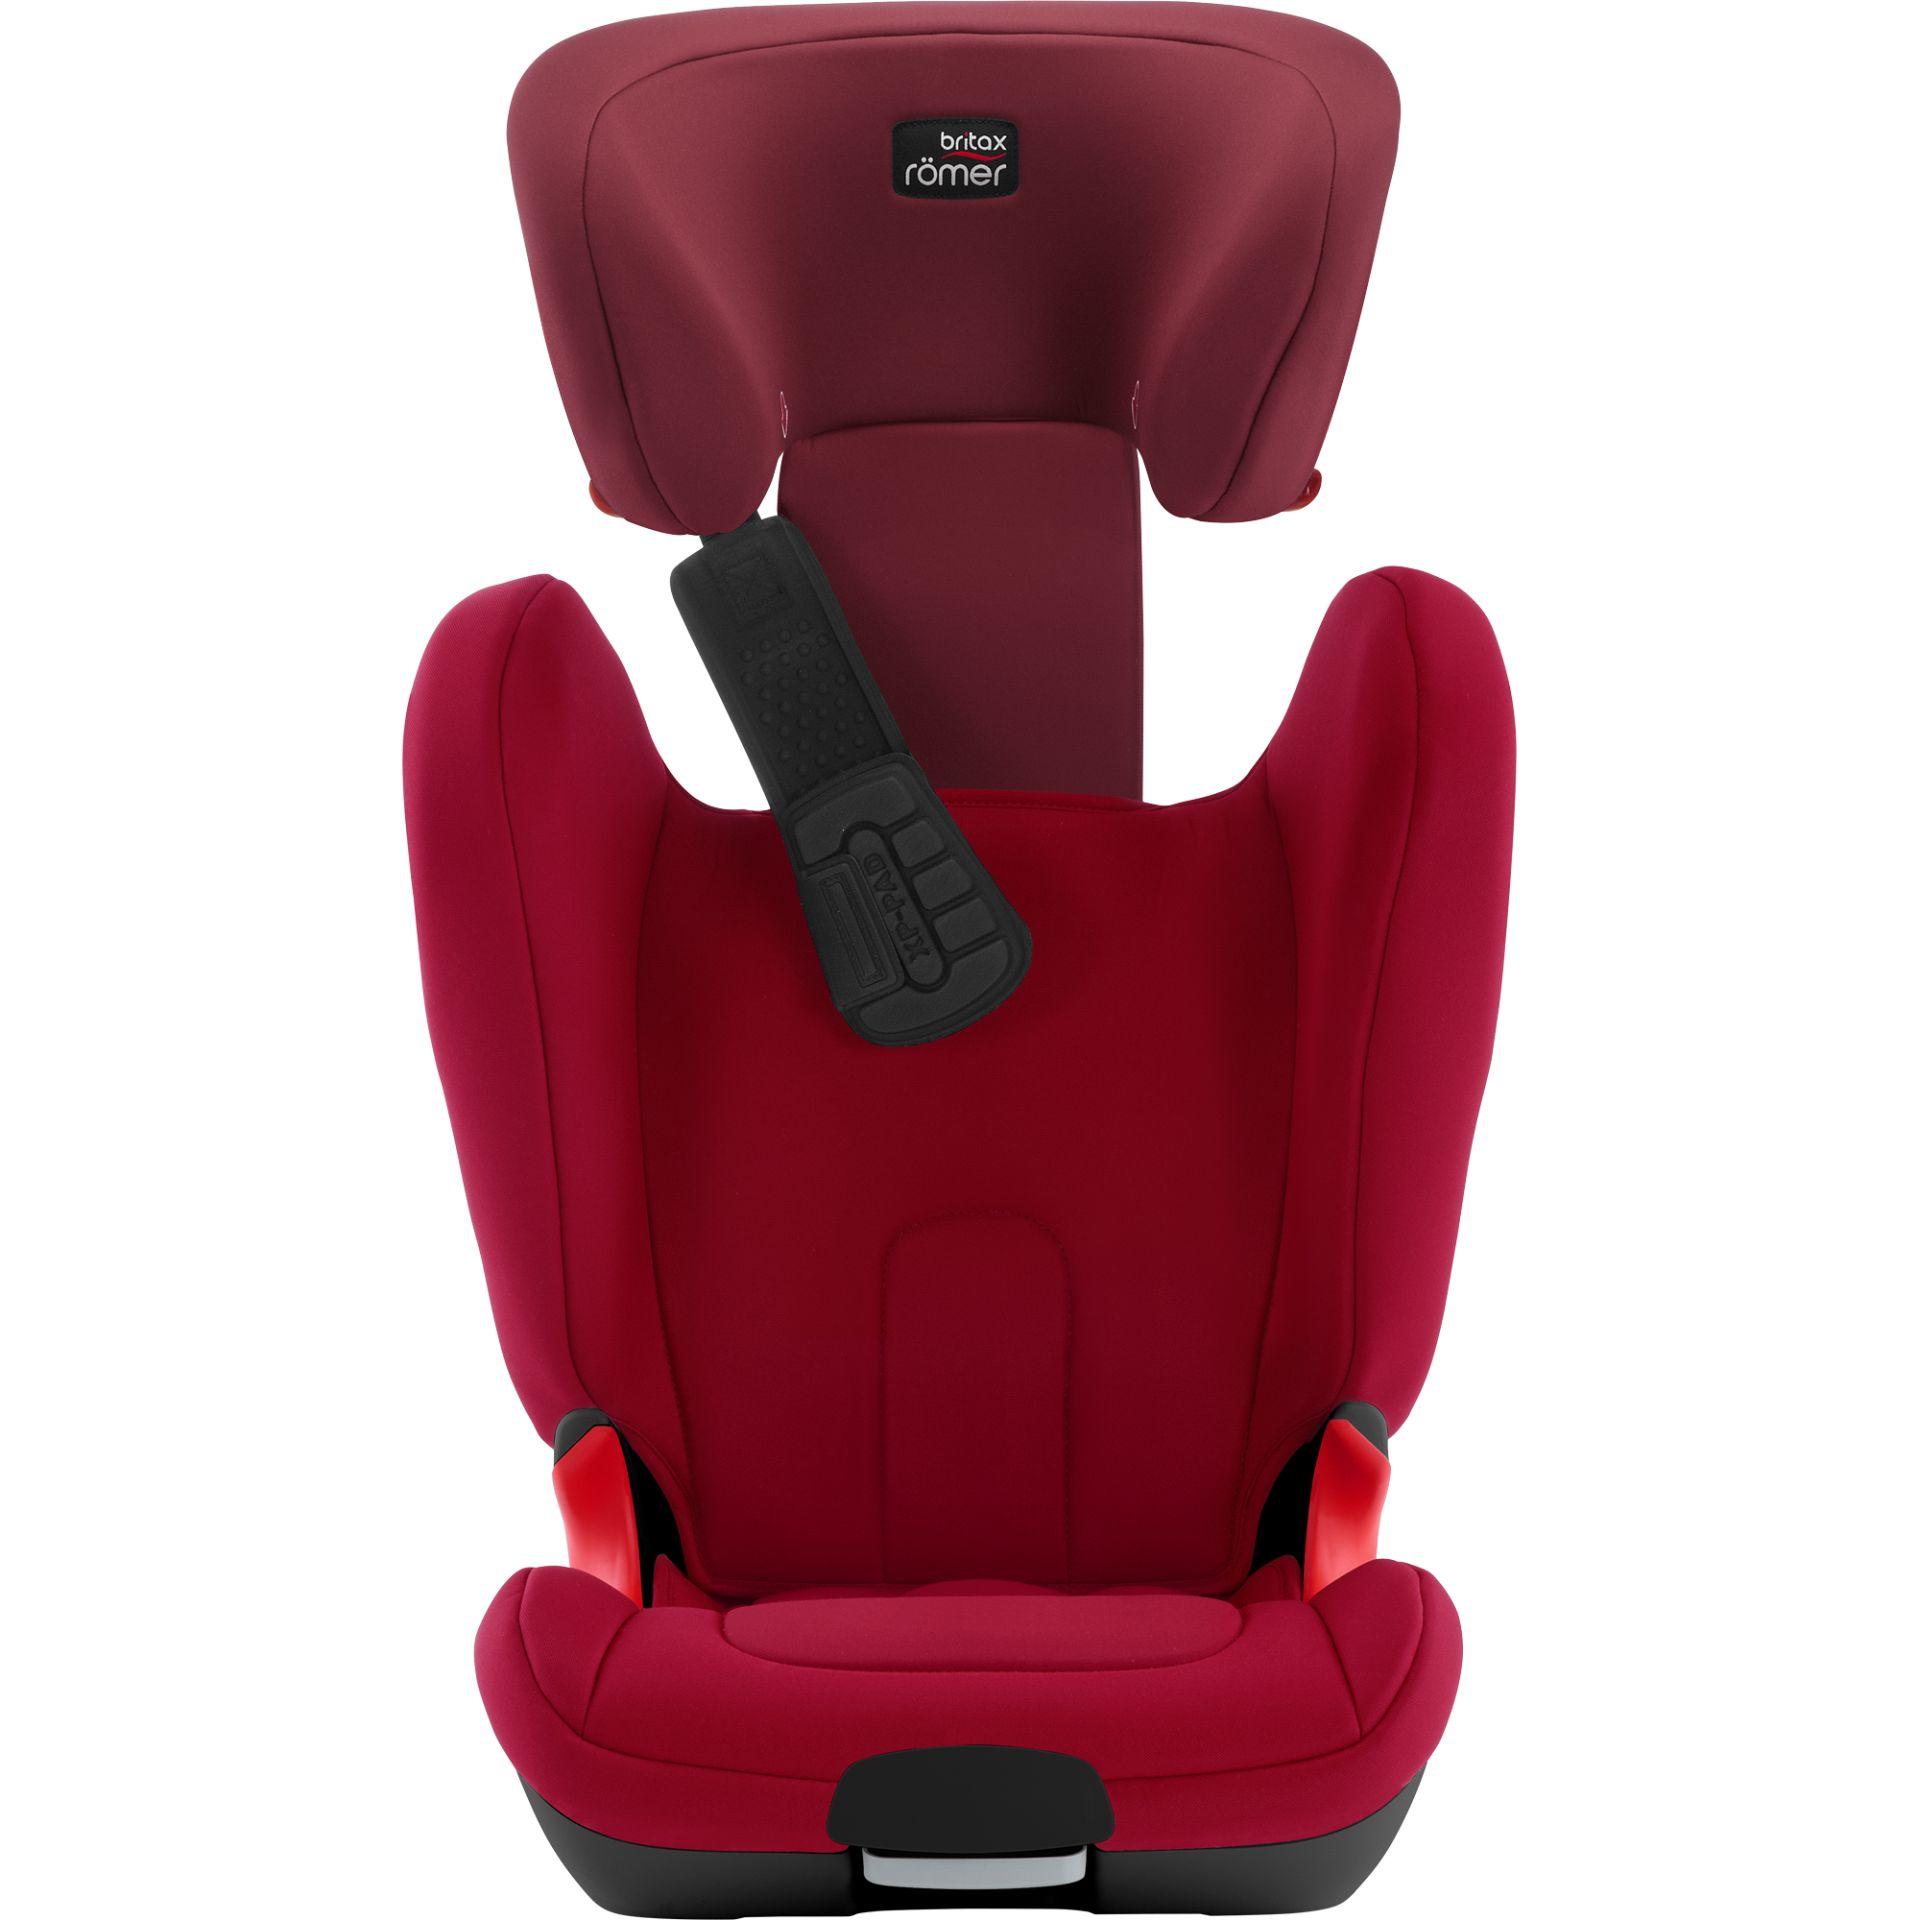 britax r mer child car seat kidfix xp black series 2018 flame red buy at kidsroom car seats. Black Bedroom Furniture Sets. Home Design Ideas